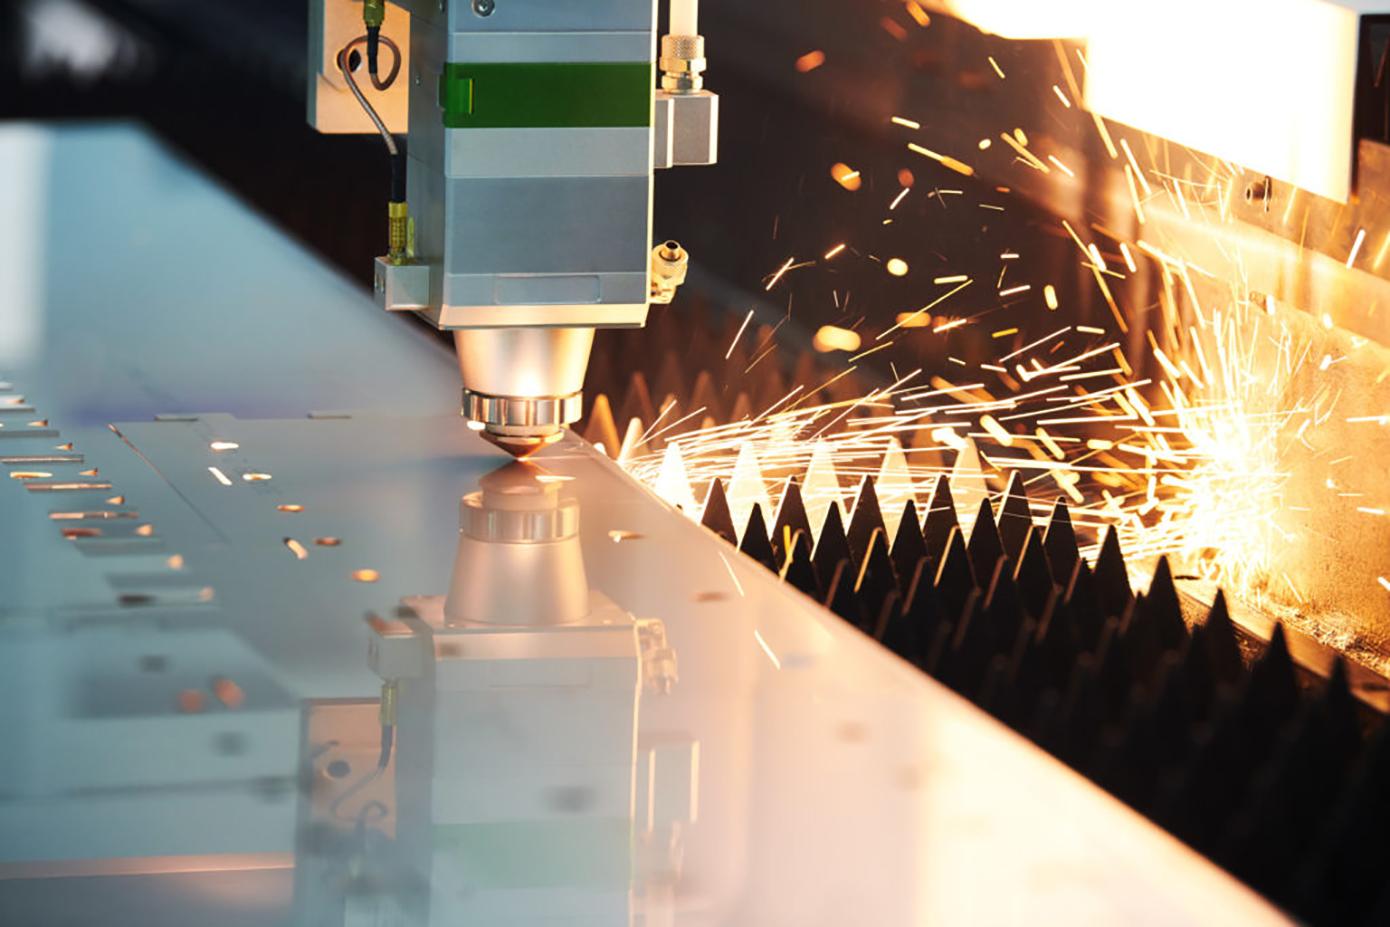 Laser cutting. Metal machining with sparks on CNC laser engraving maching